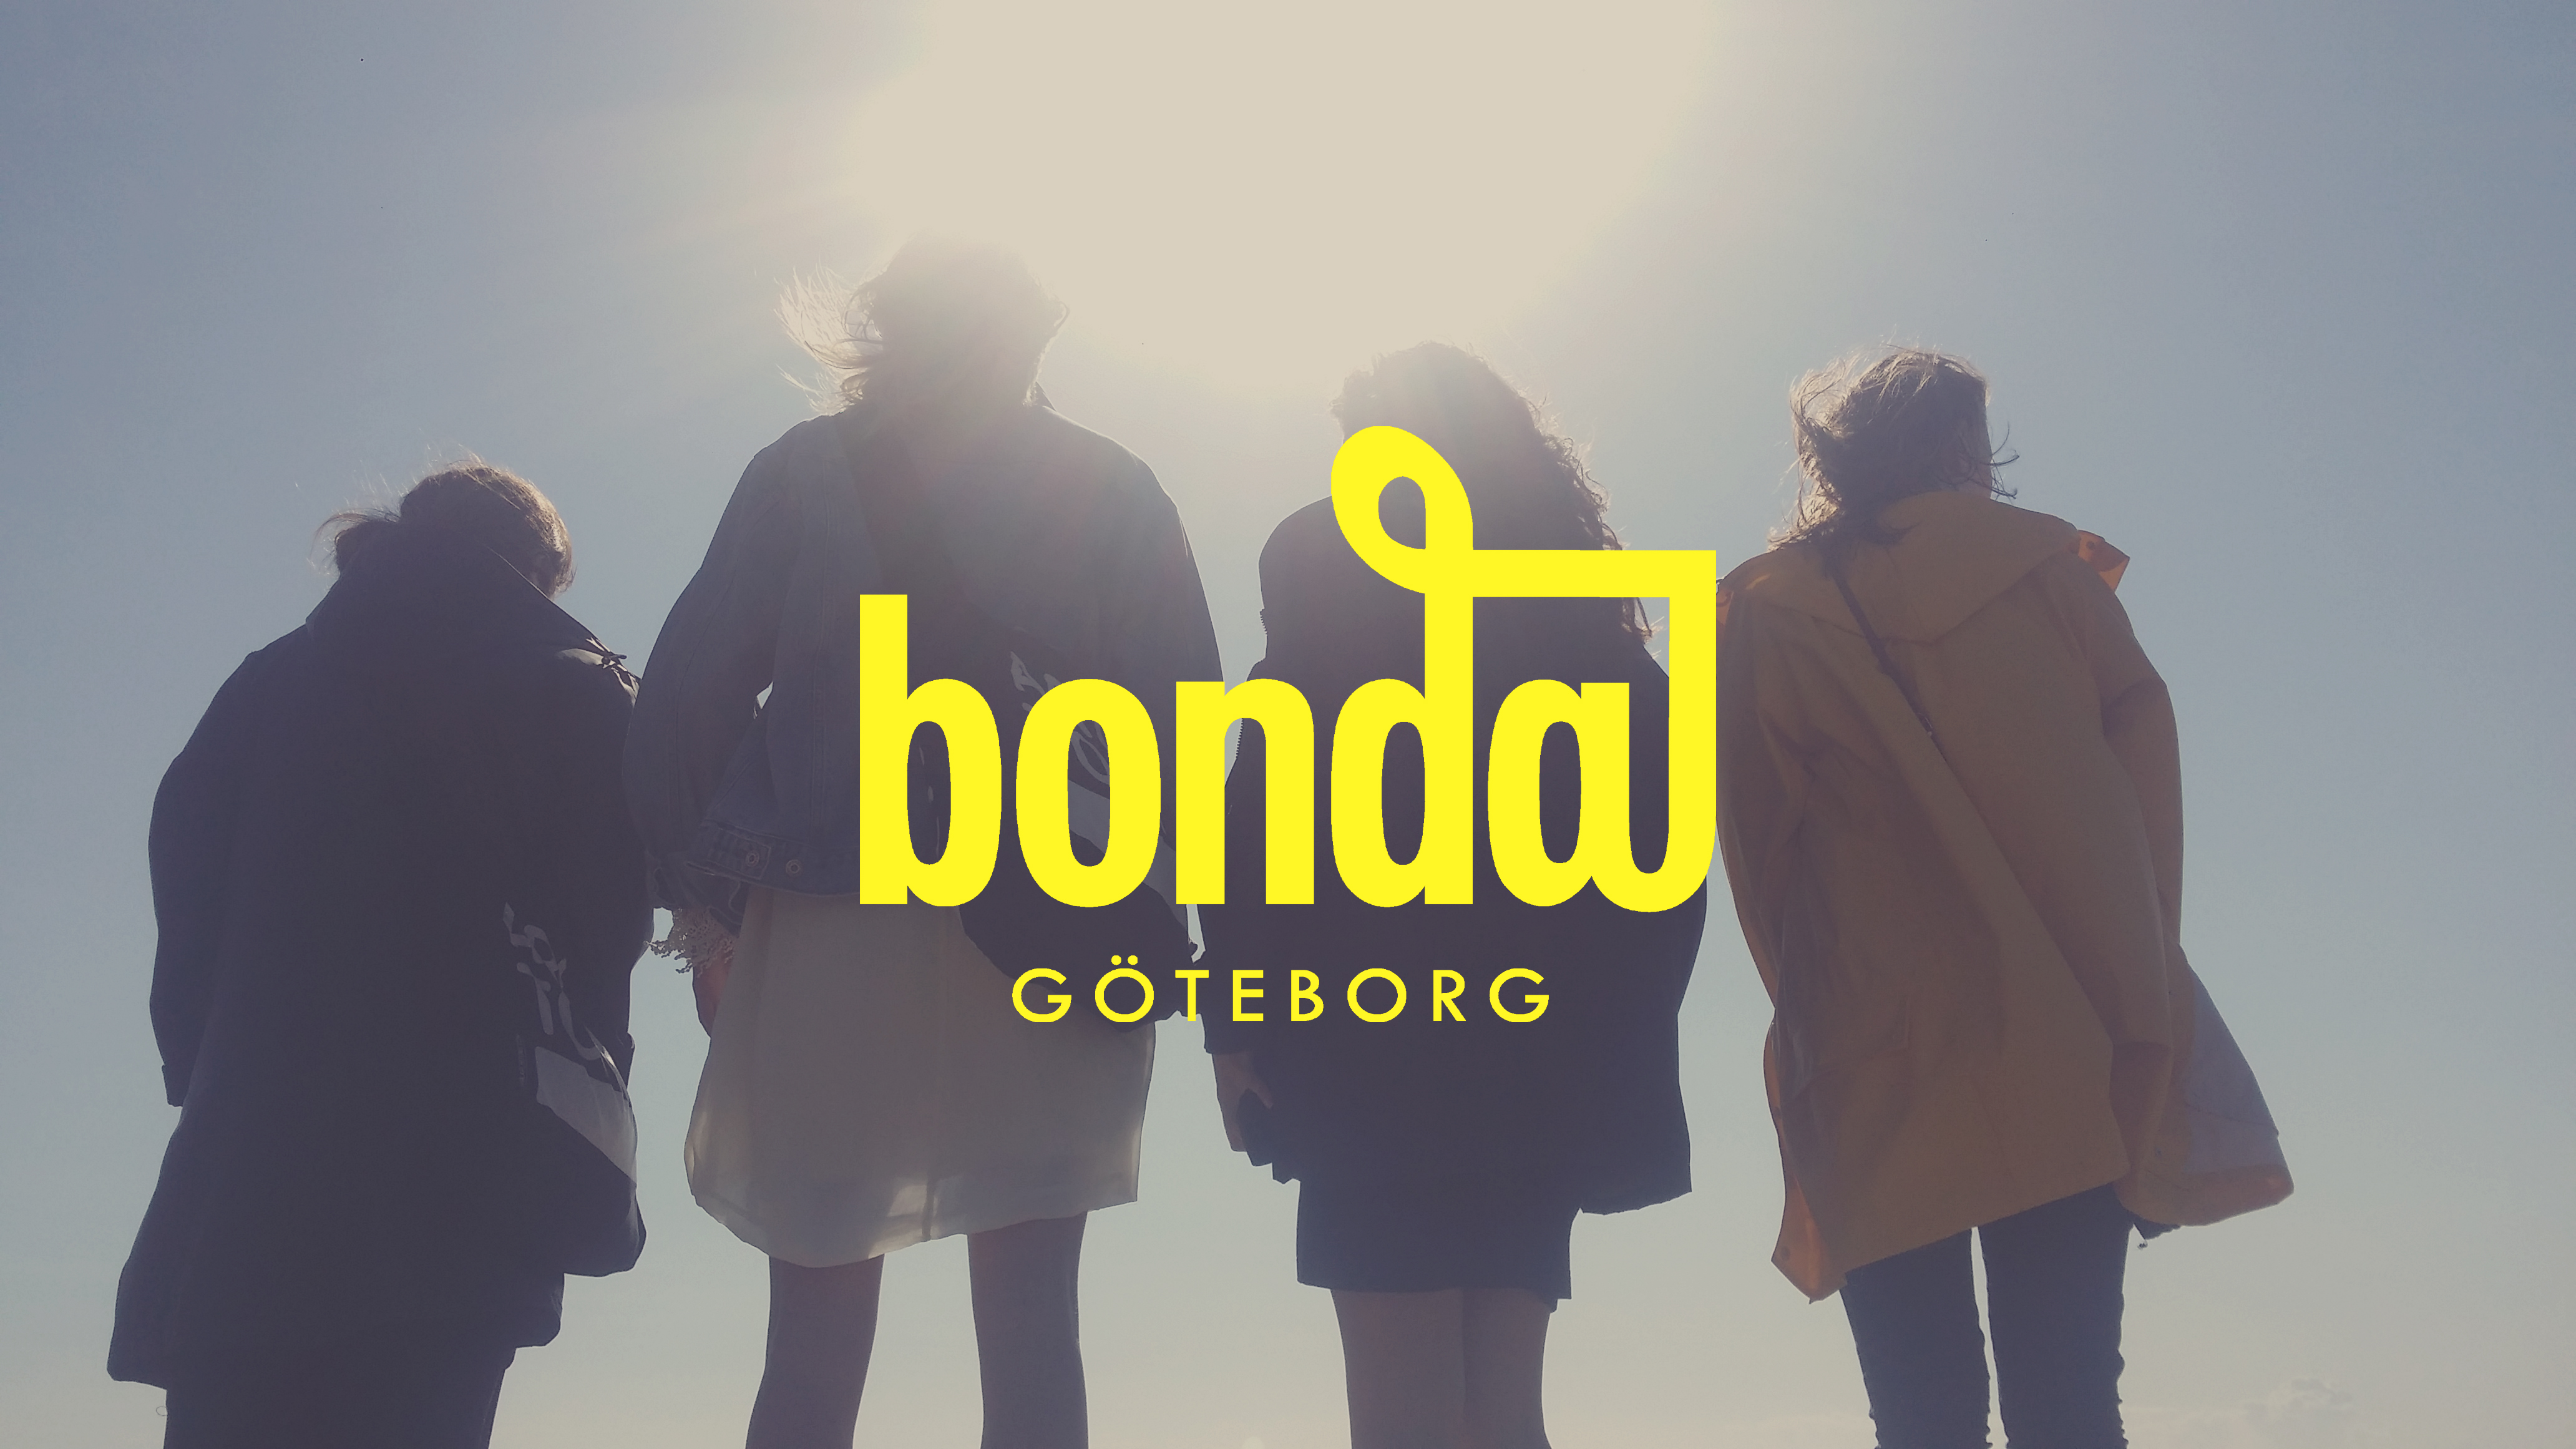 Bonda logo